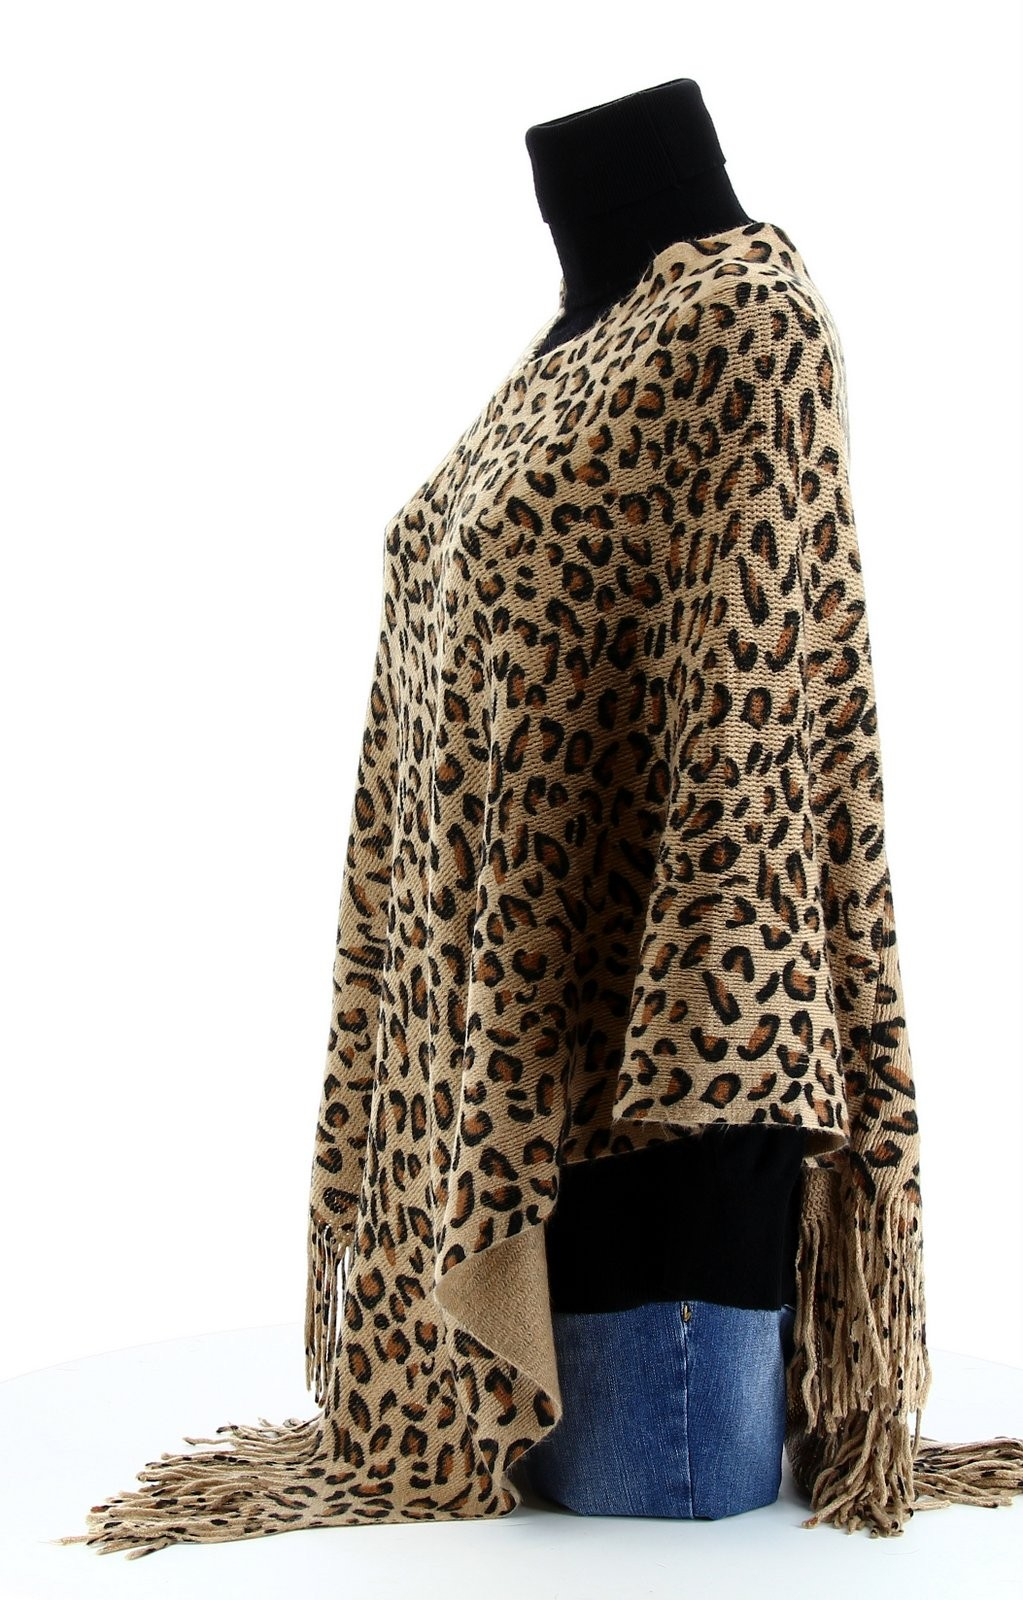 poncho cape l opard beige 36 46 pull hiver benedicte femme ebay. Black Bedroom Furniture Sets. Home Design Ideas